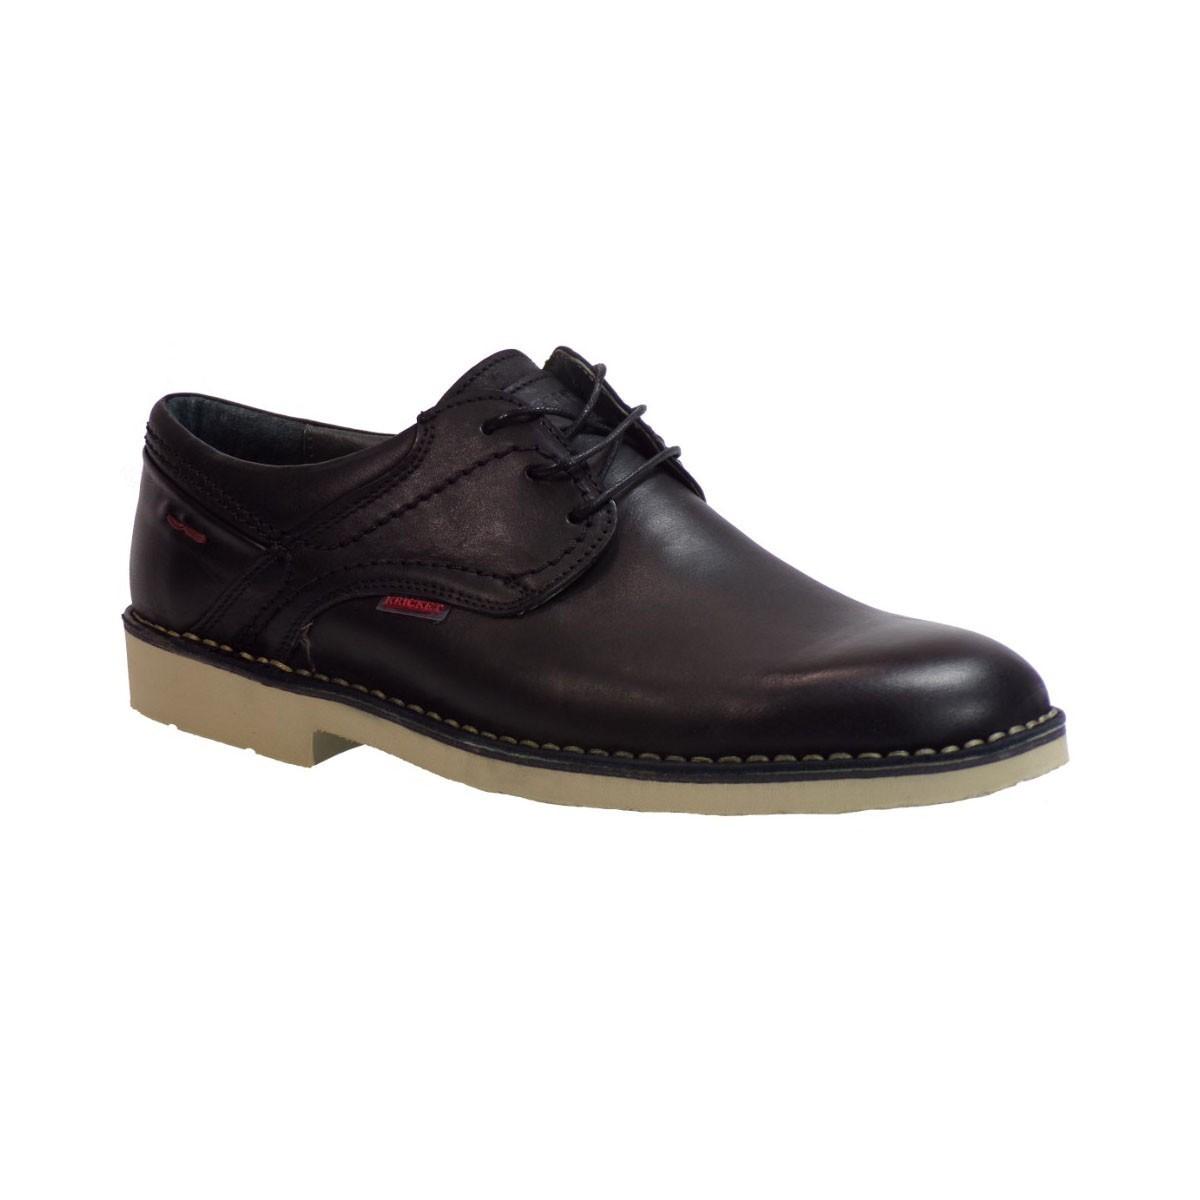 kricket Ανδρικά Παπούτσια FLEX2 Μαύρο Kricket FLEX2 Μ